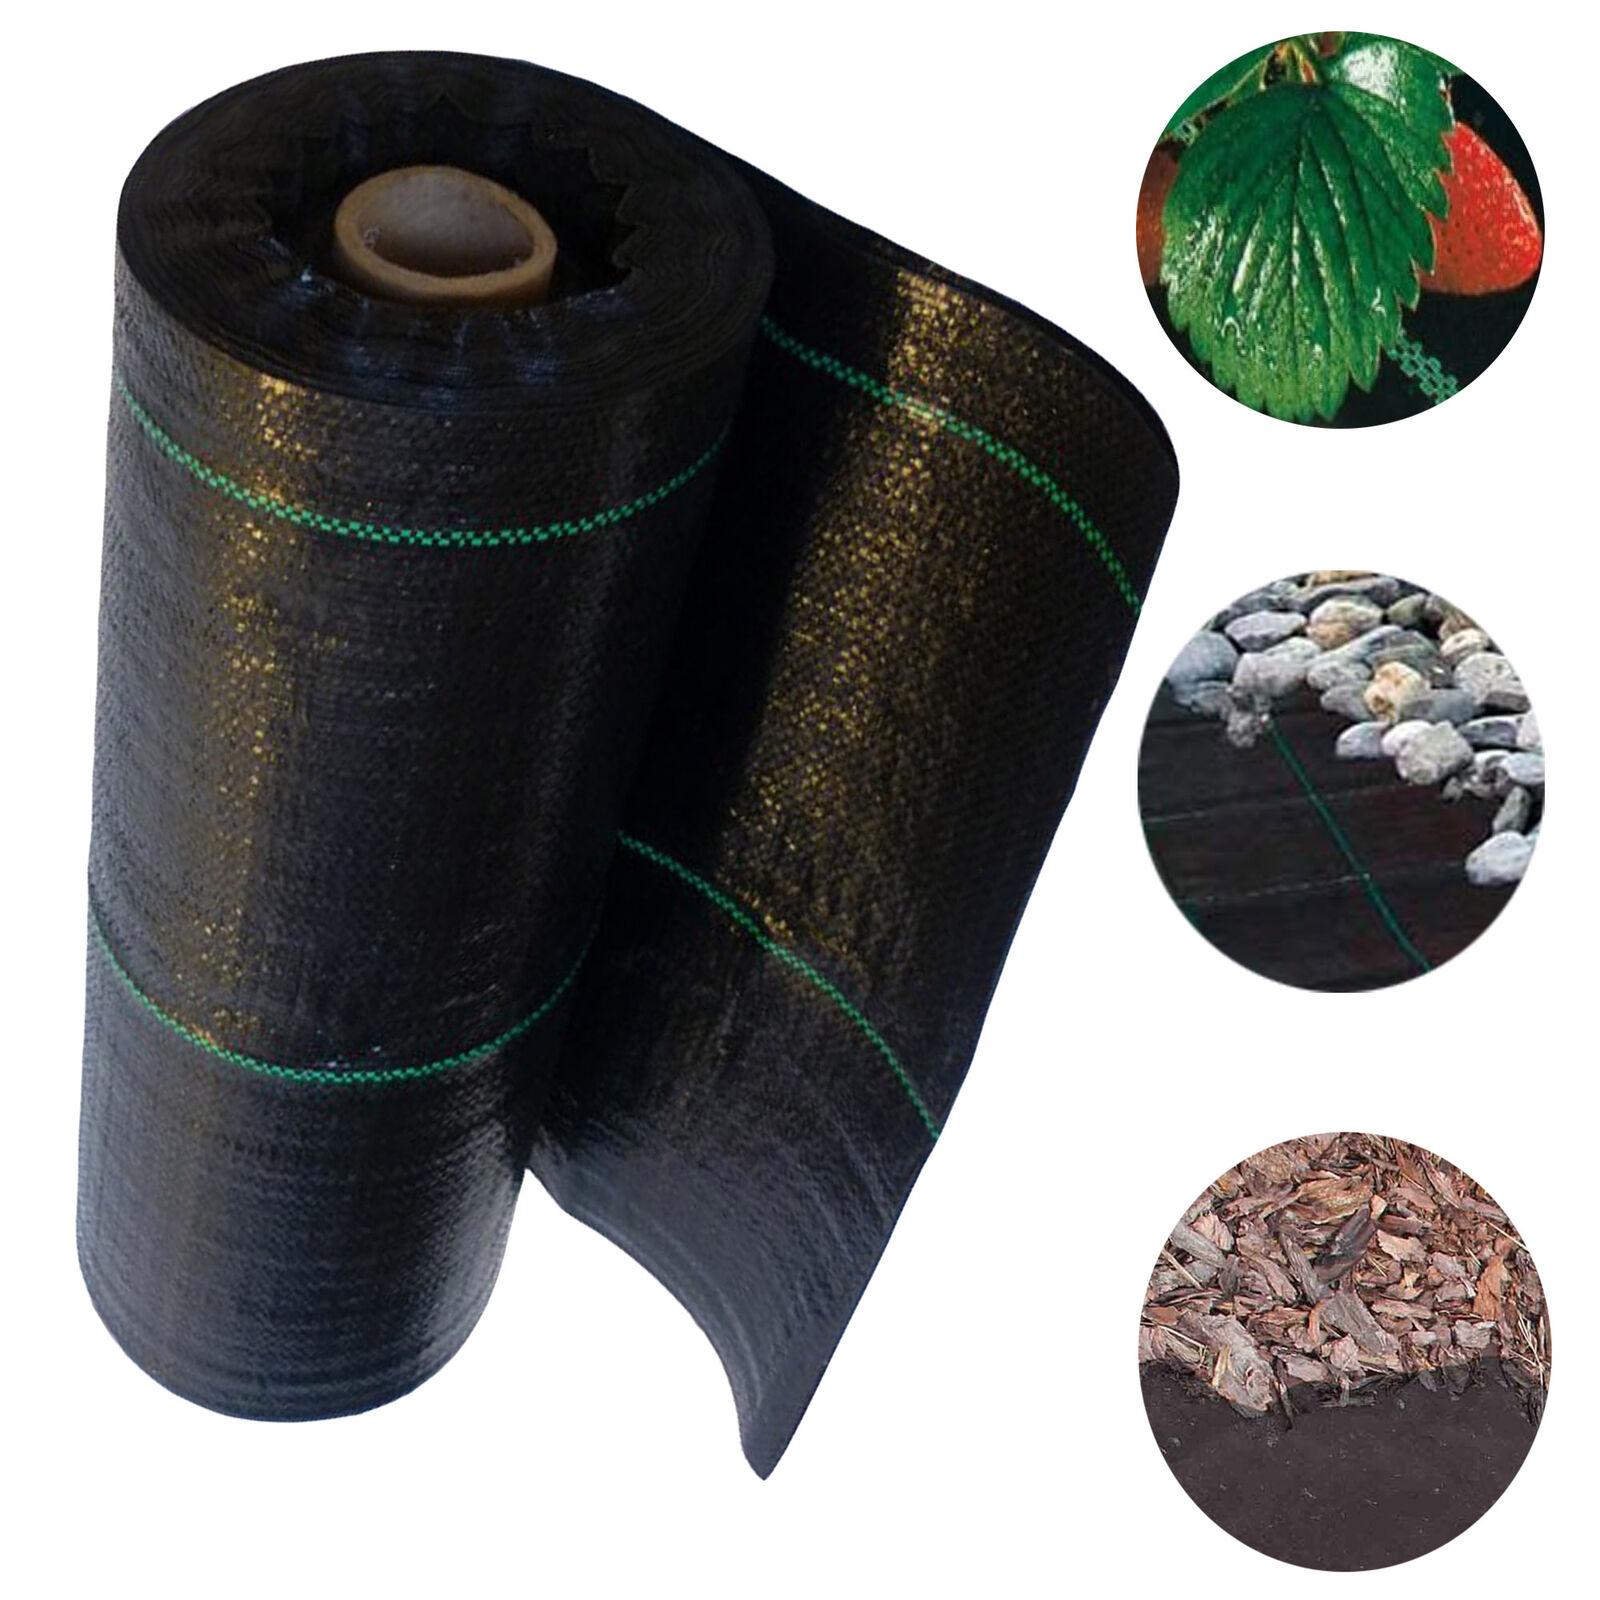 Malla antihierbas malla antihierbas tela suelo projo malas hierbas 90g 1,1m x 100m negro